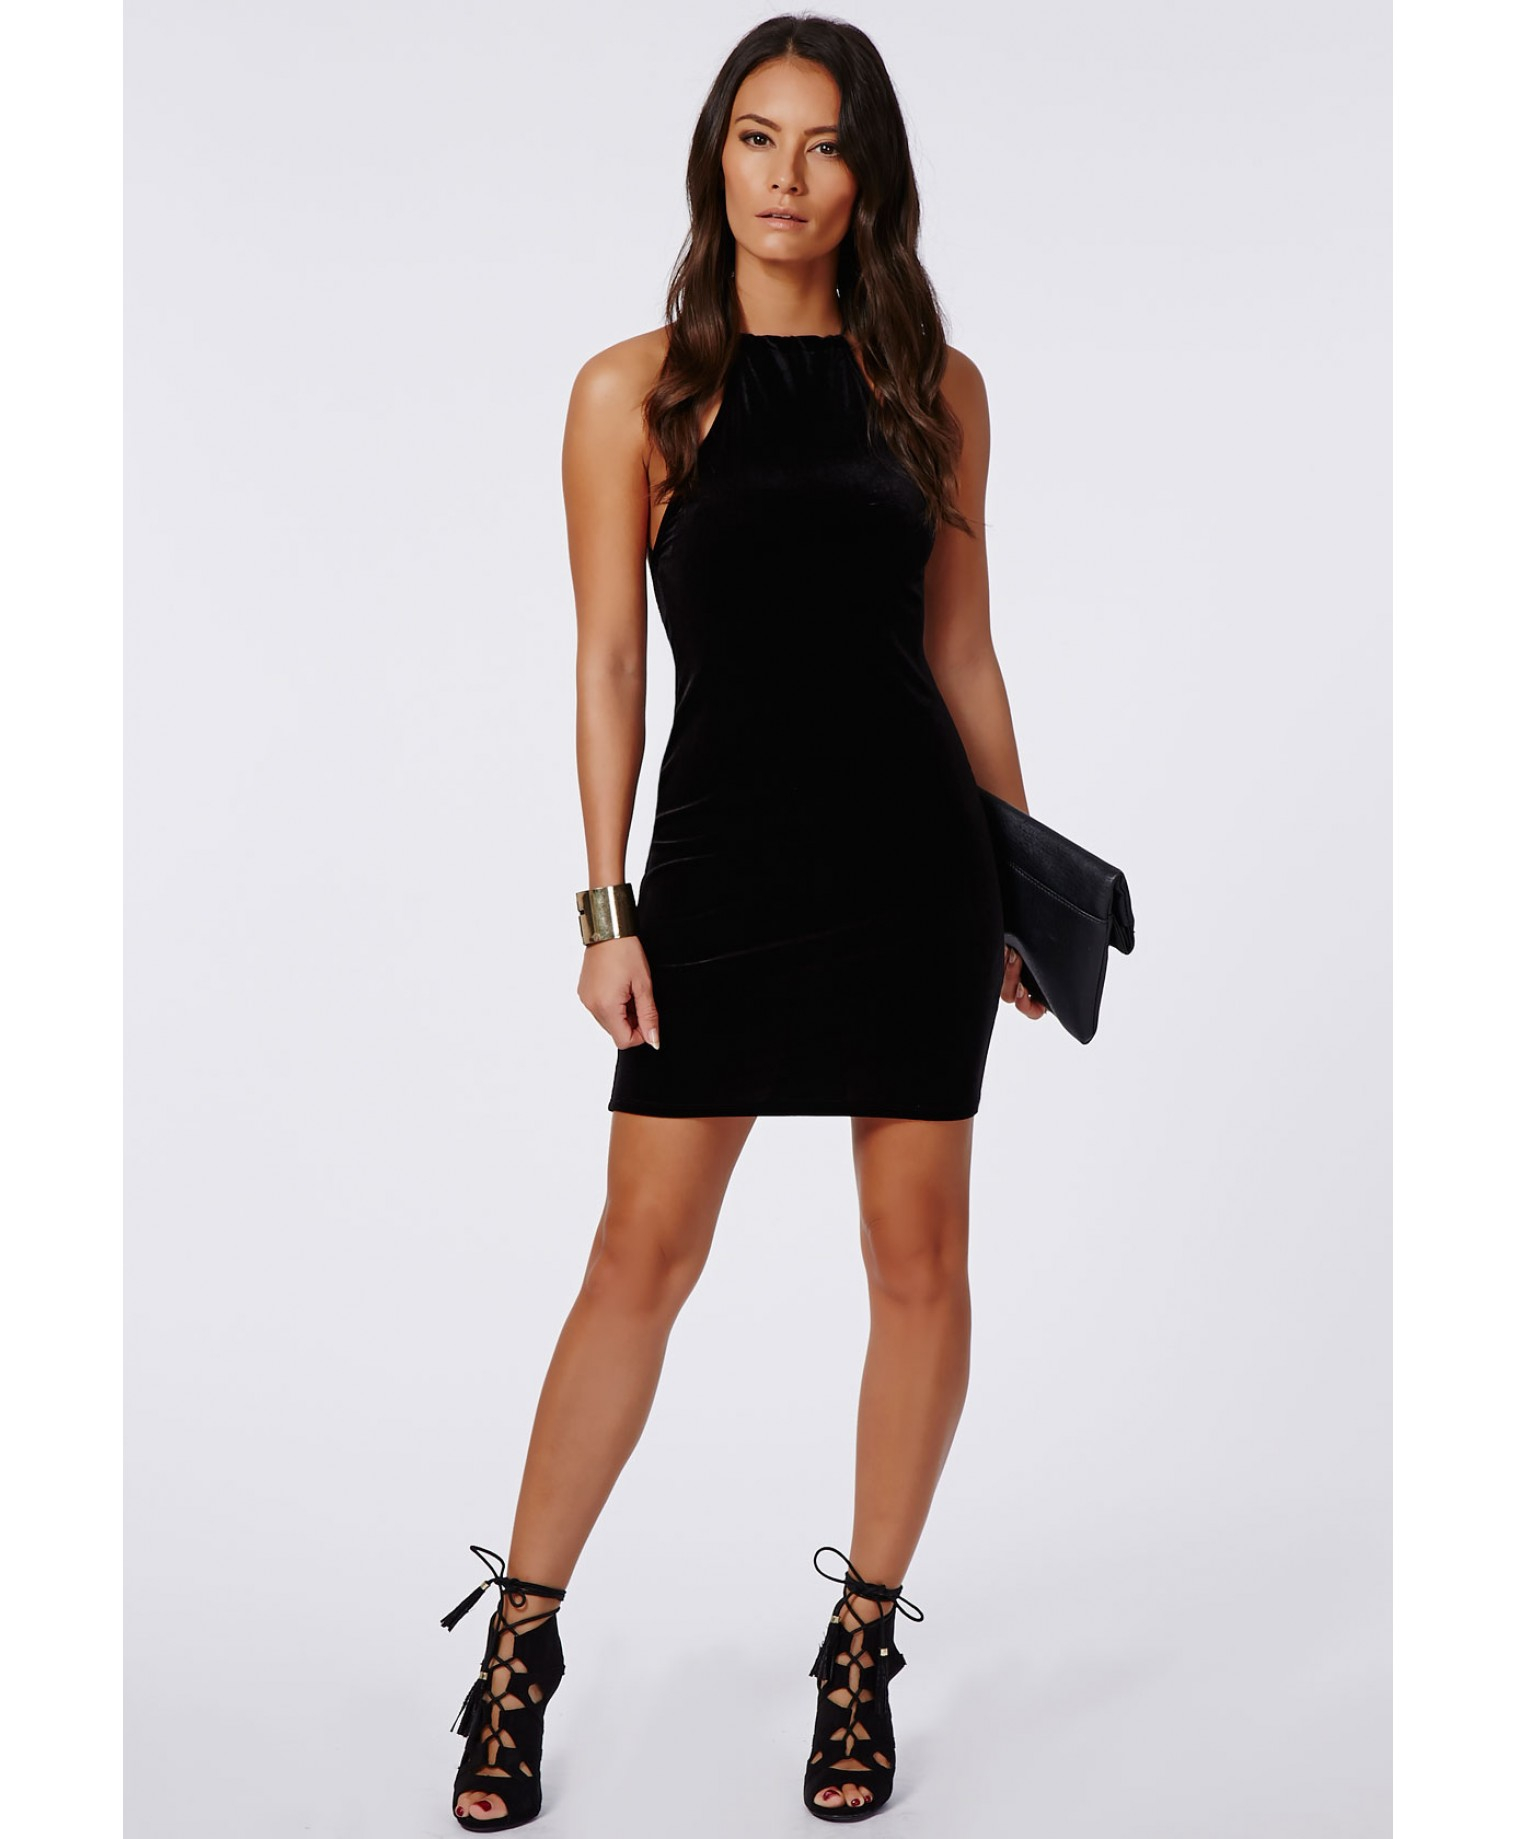 Lyst - Missguided Masumi Velvet Strappy Bodycon Dress Black in Black